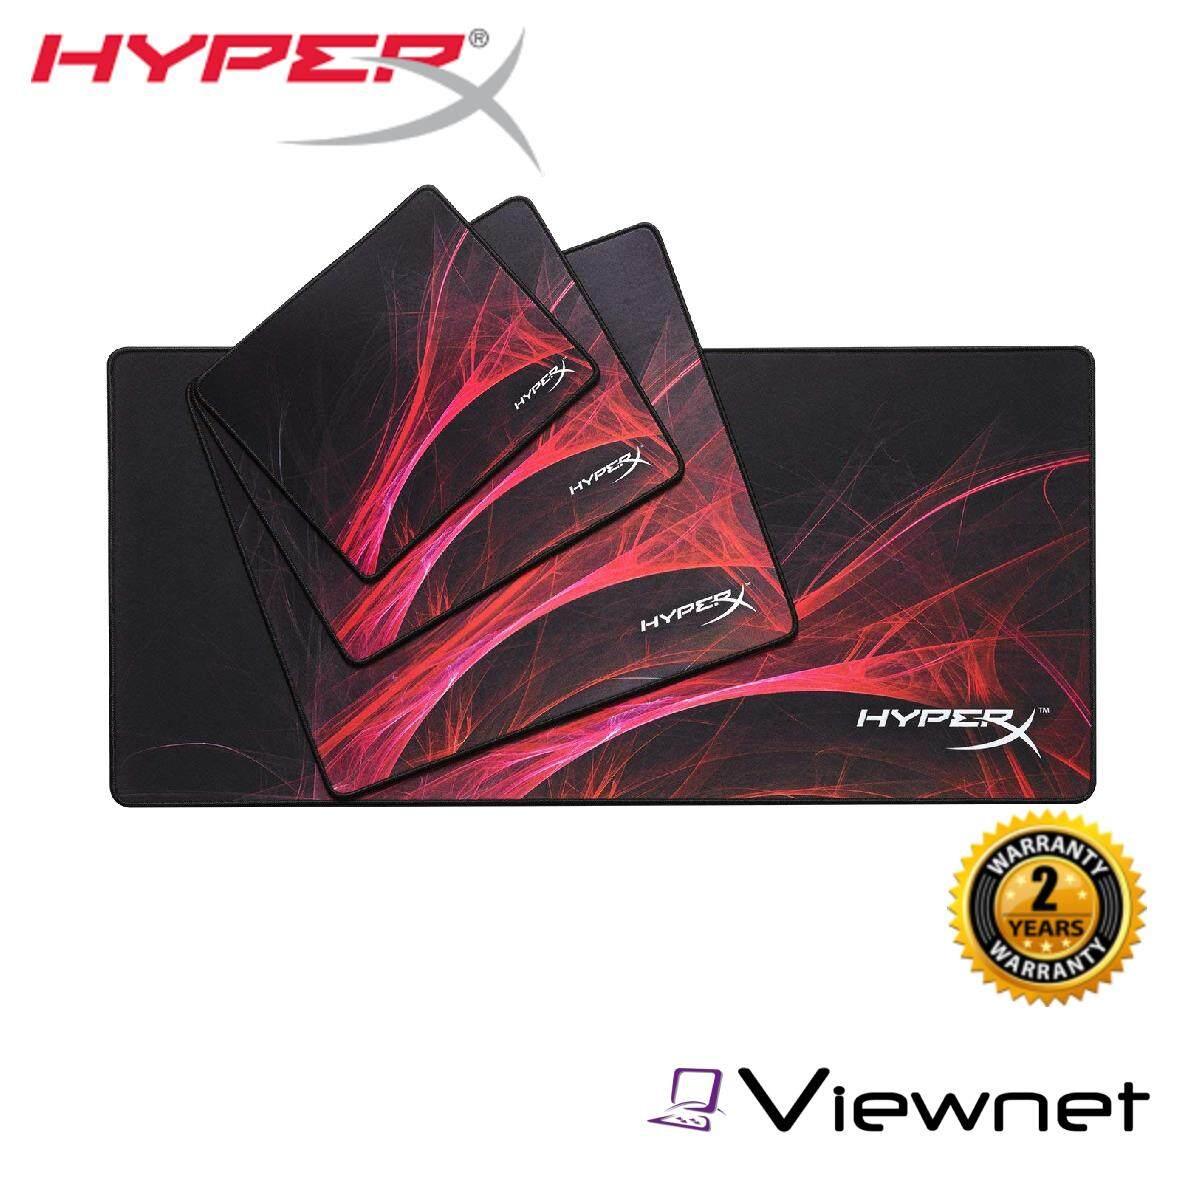 HyperX FURY S Speed Edition Pro Gaming Speed Edition Mouse Pad (S/M/L/XL) (HX-MPFS-S-S/HX-MPFS-S-M/HX-MPFS-S-L/HX-MPFS-S-XL)